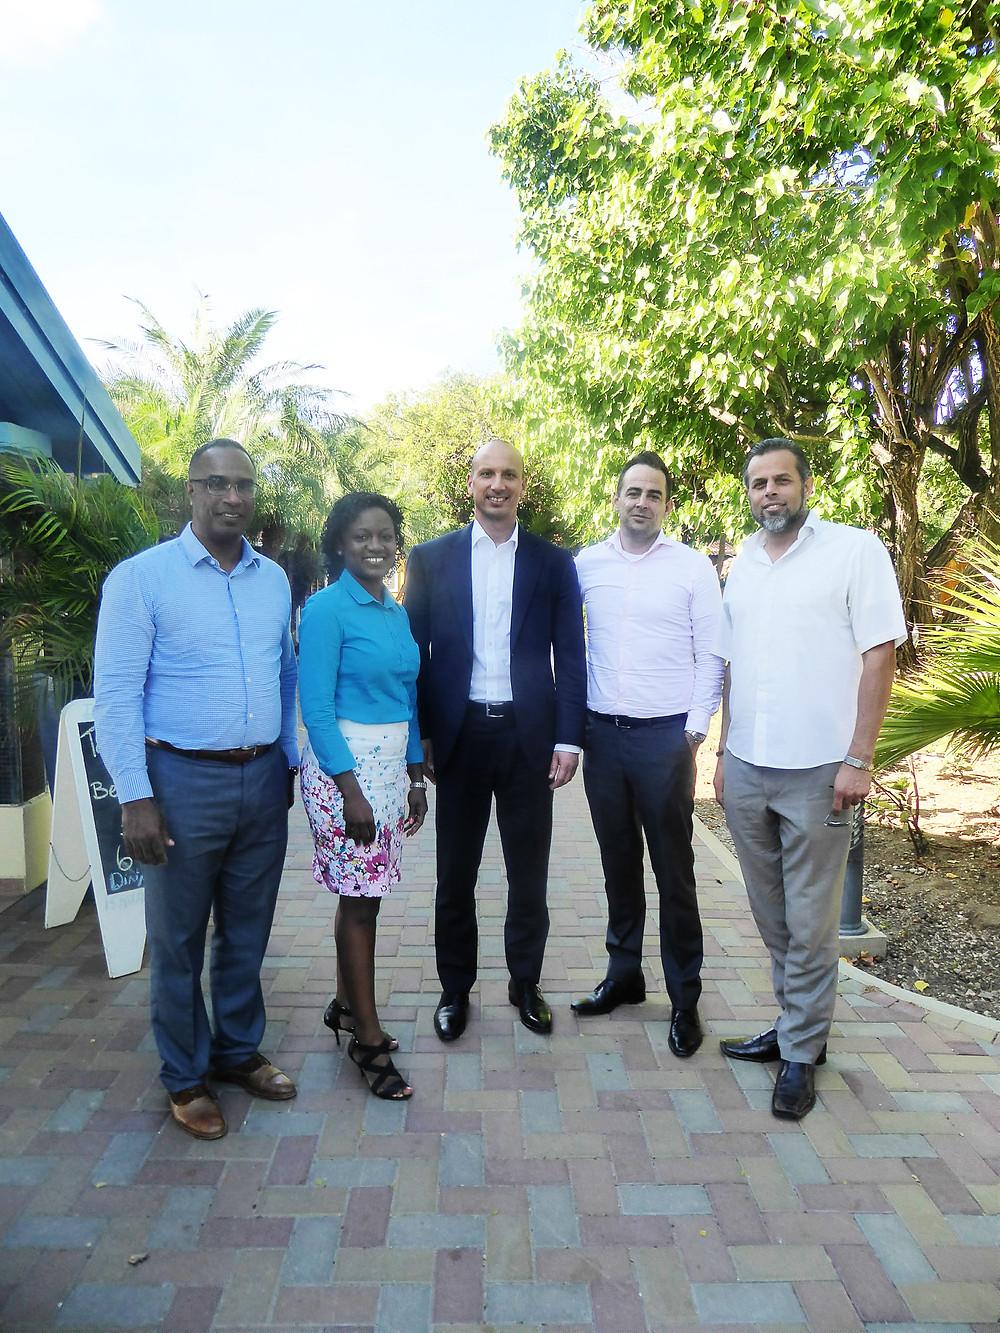 XpBonaire, IslandLife, Bonaire, News, Information. CBS, Stats, System